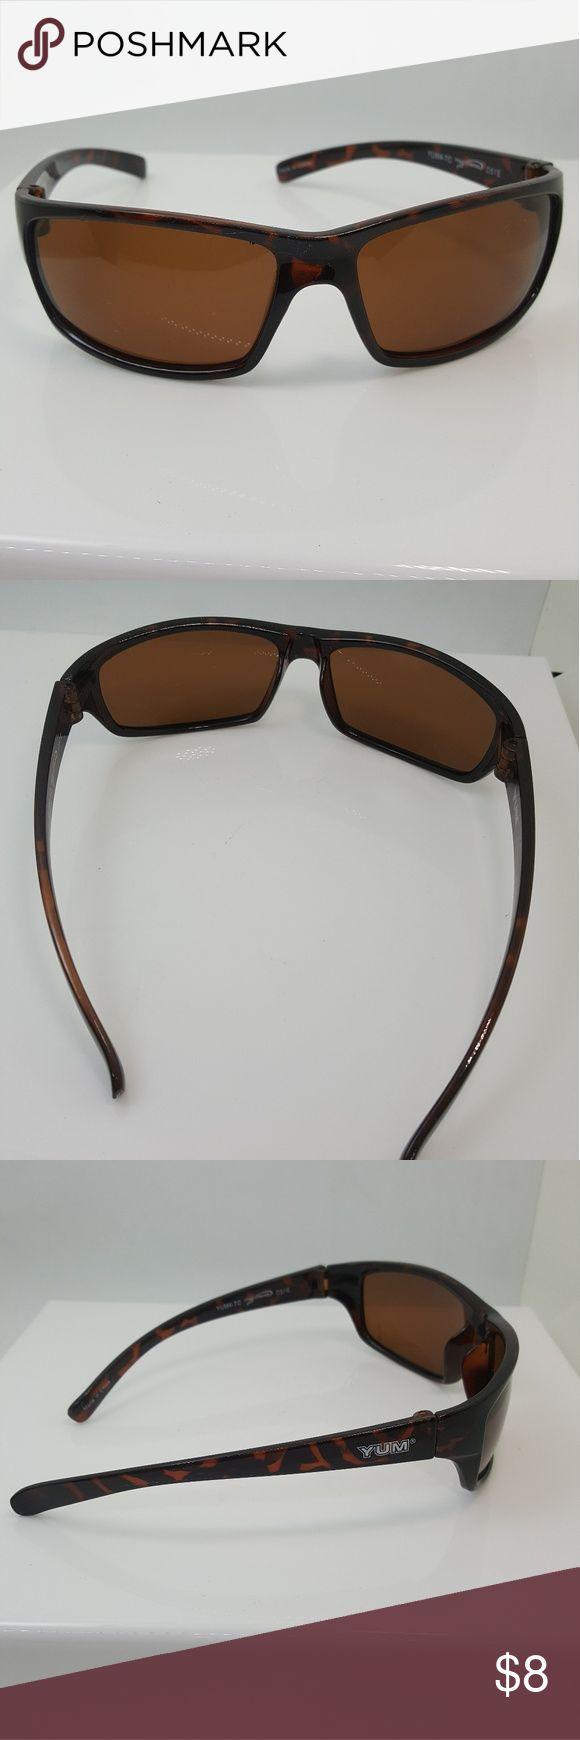 Fishing polarized uv sunglasses Yum brand fishing polarized sunglasses Yum Accessories Sunglasses